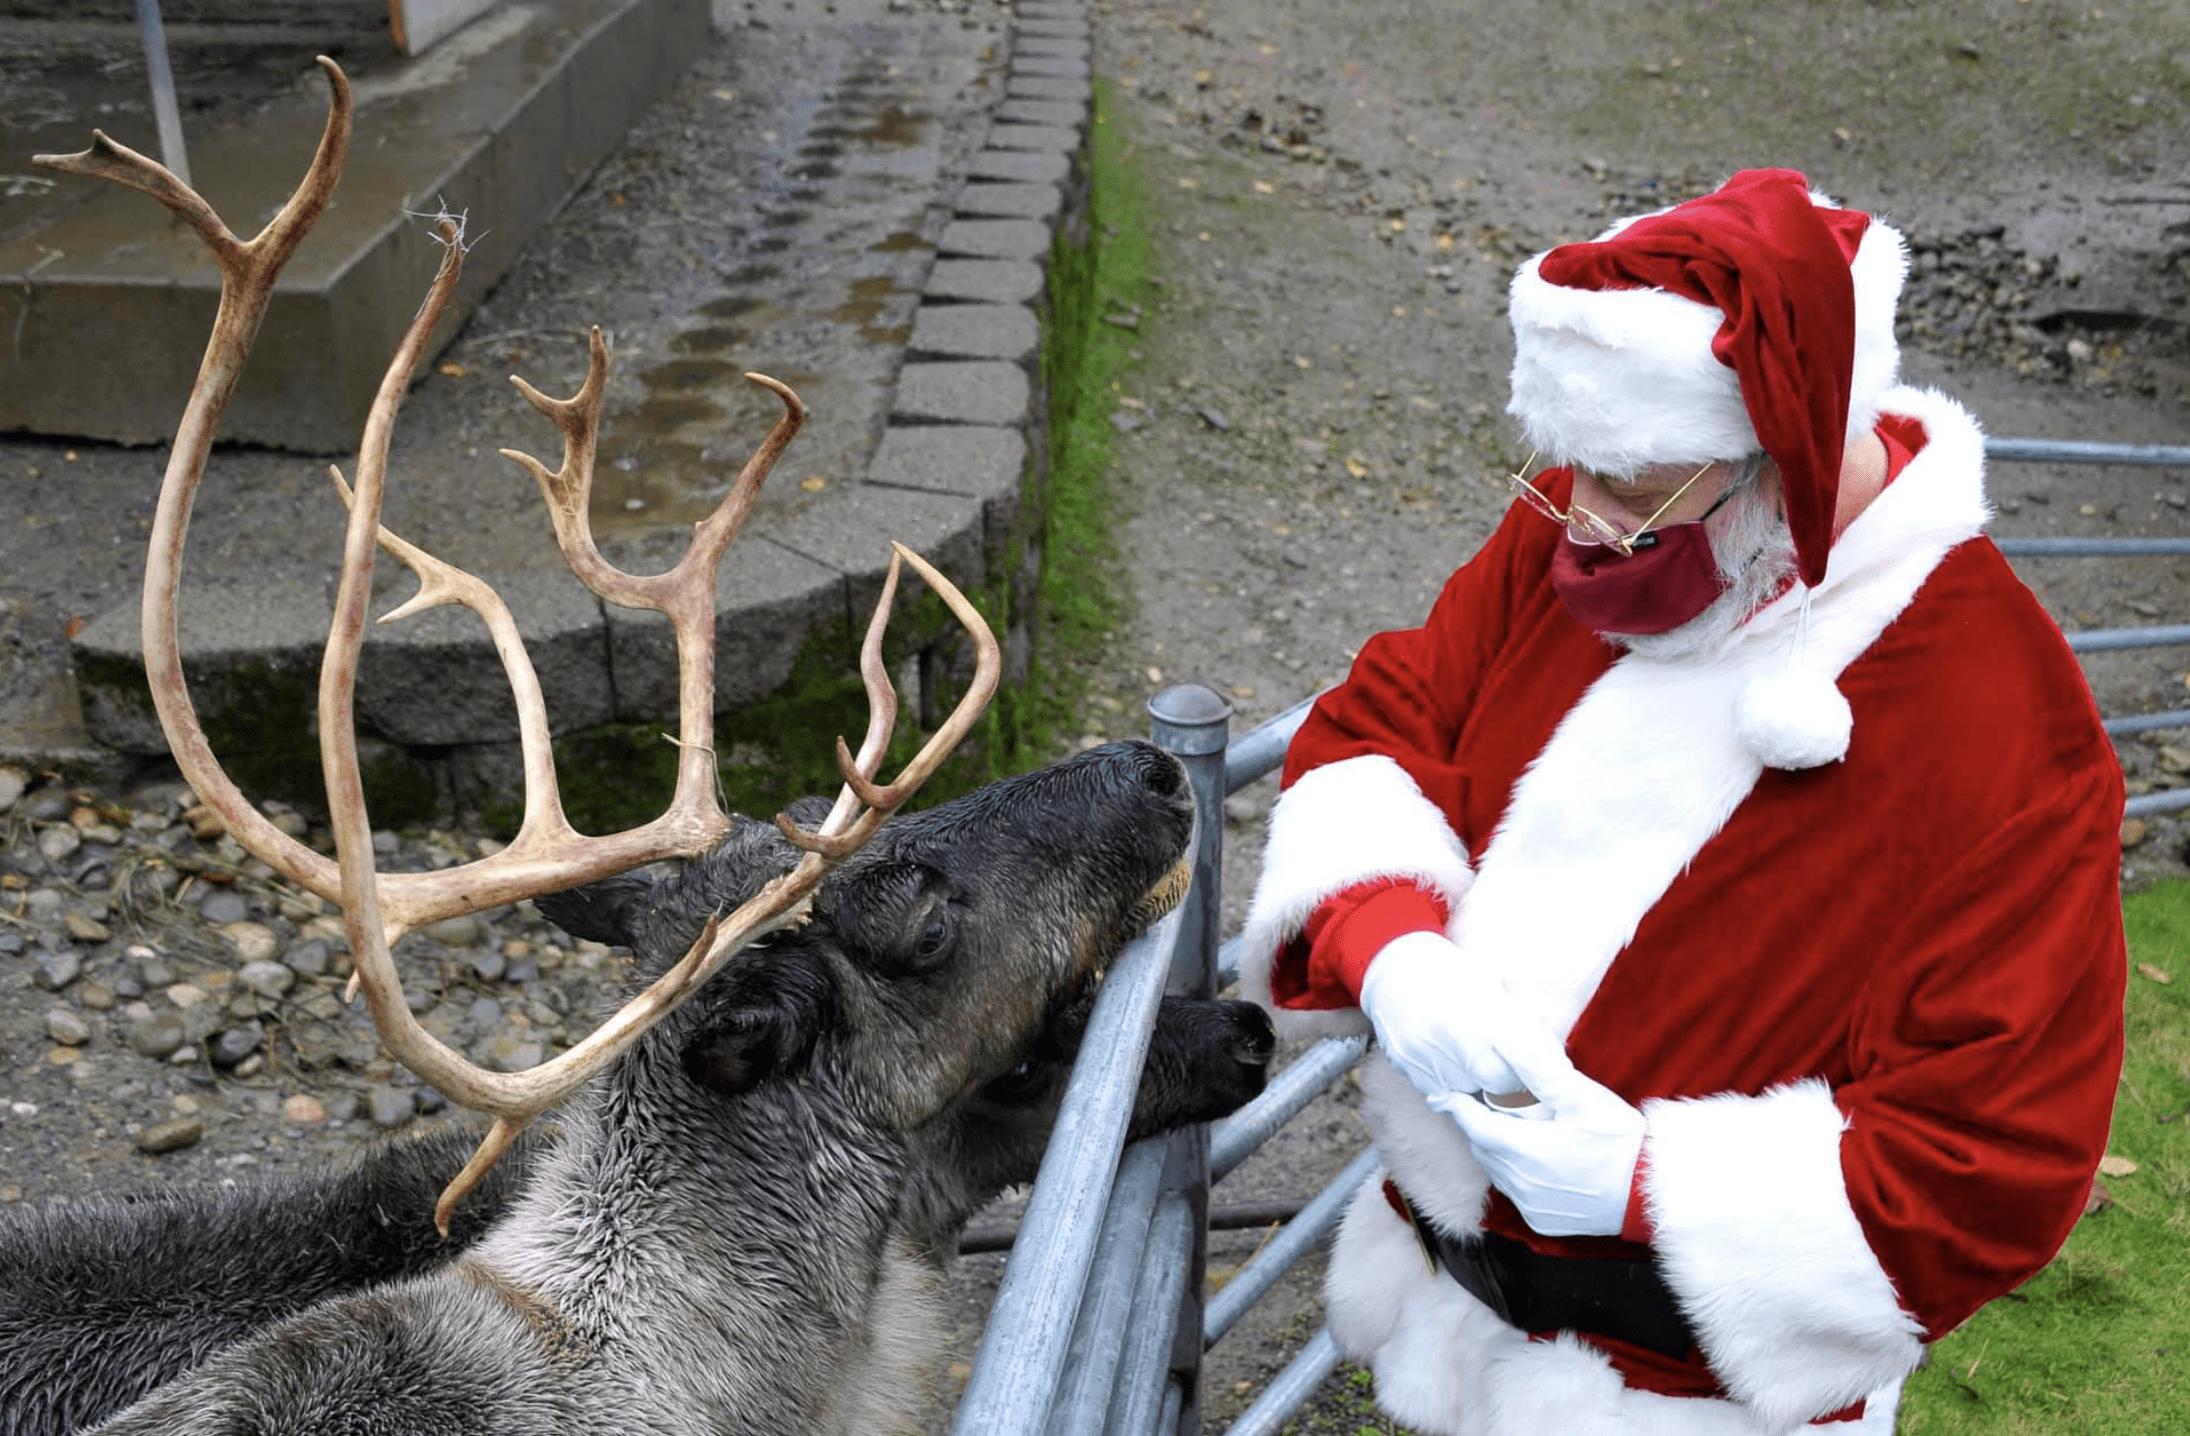 Issaquah Reindeer Festival